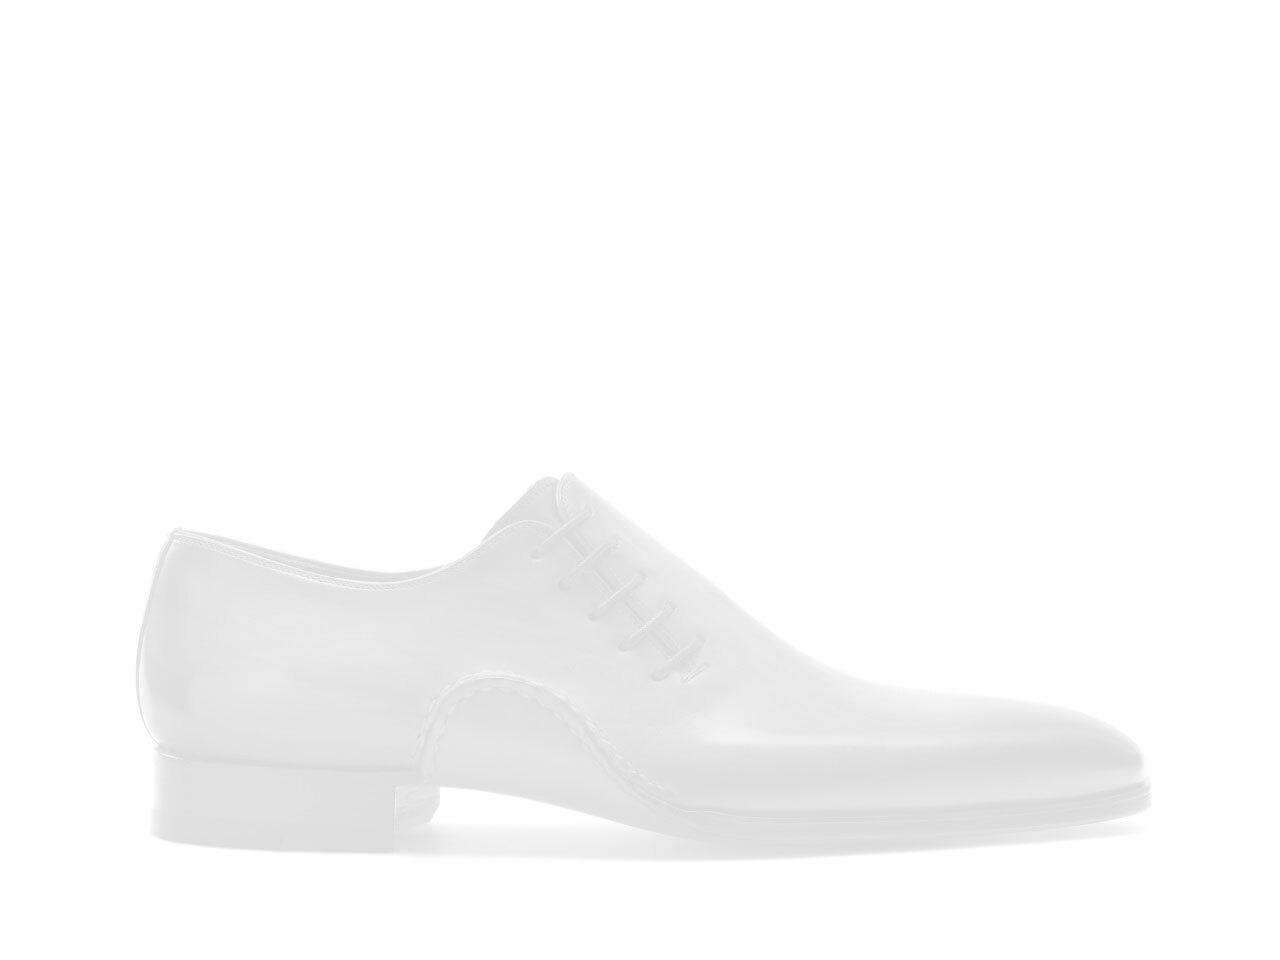 Mid brown suede double monk strap shoes for men - Magnanni